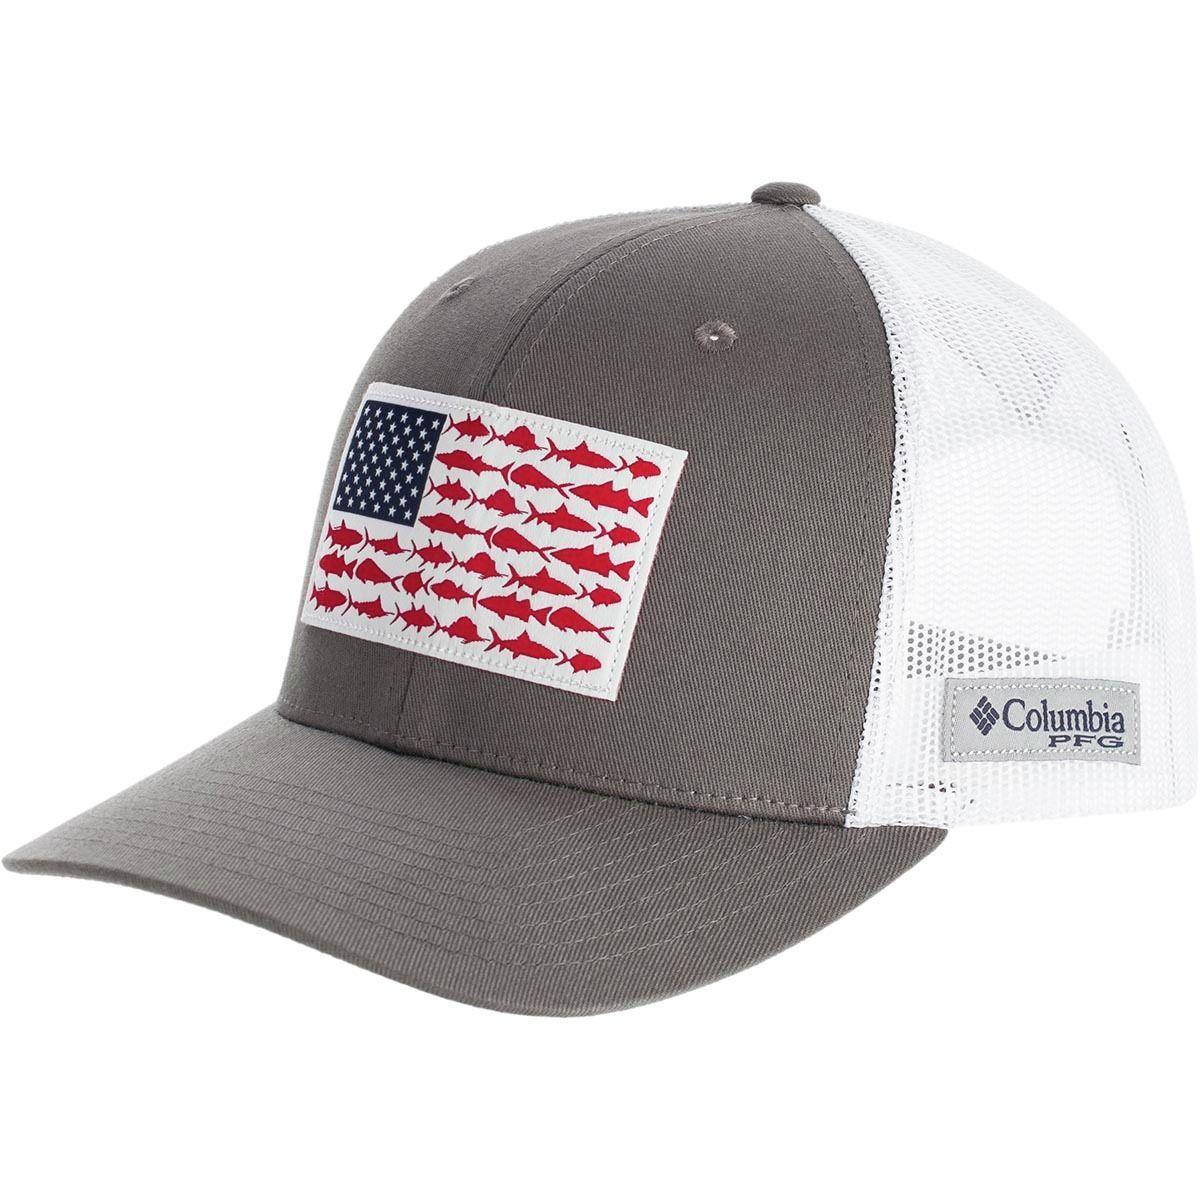 Pfg Mesh Fish Flag Snap Back Trucker Hat In 2021 Ball Cap Columbia Pfg Columbia Hat